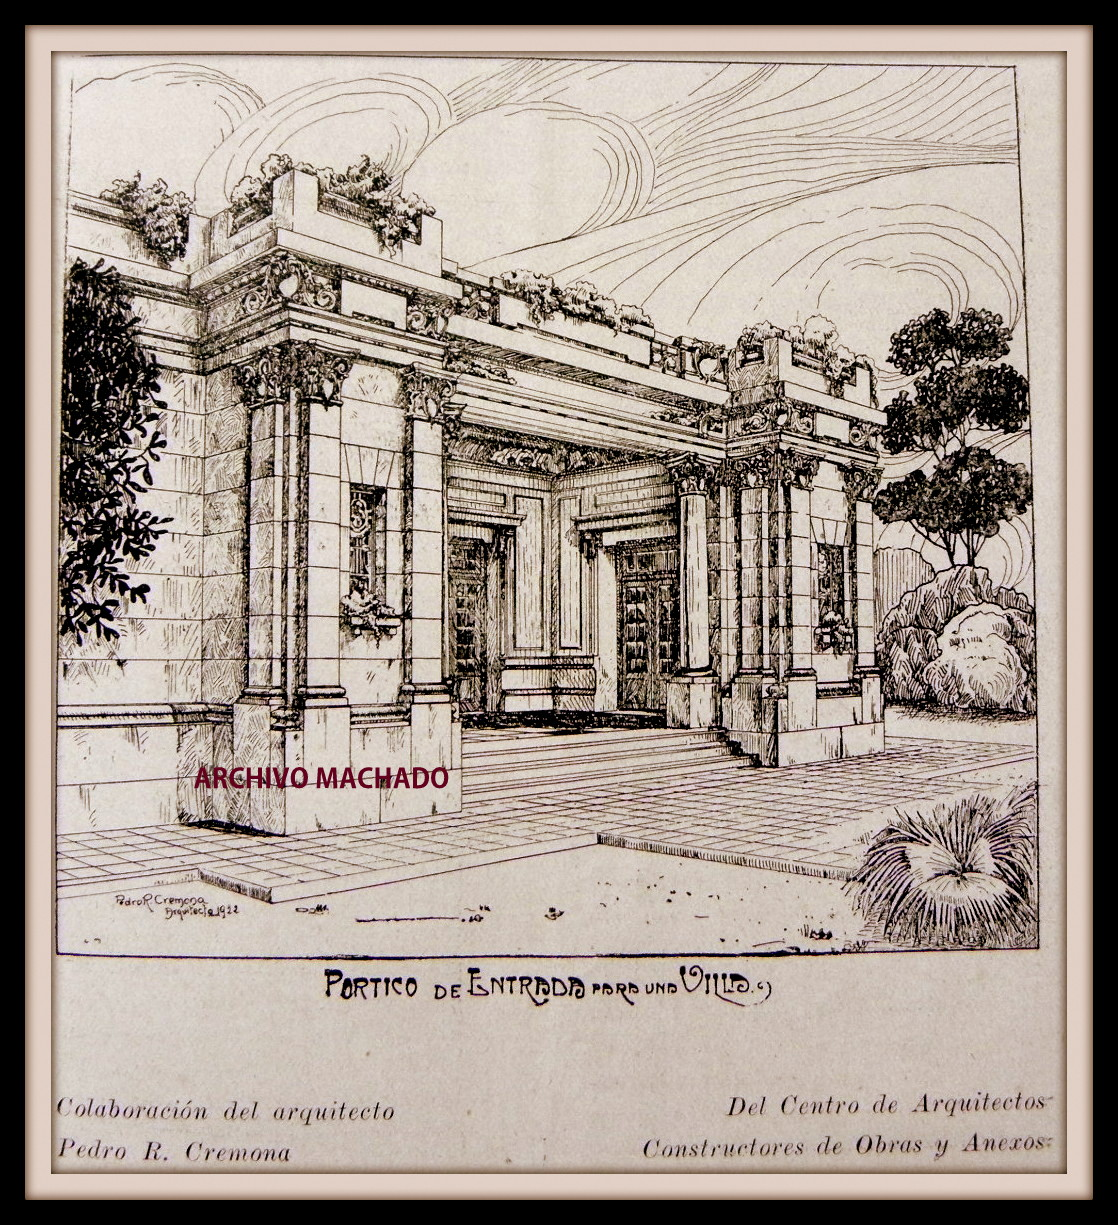 Arquitectos italianos en buenos aires arquitecto pedro r for Arquitecto constructor